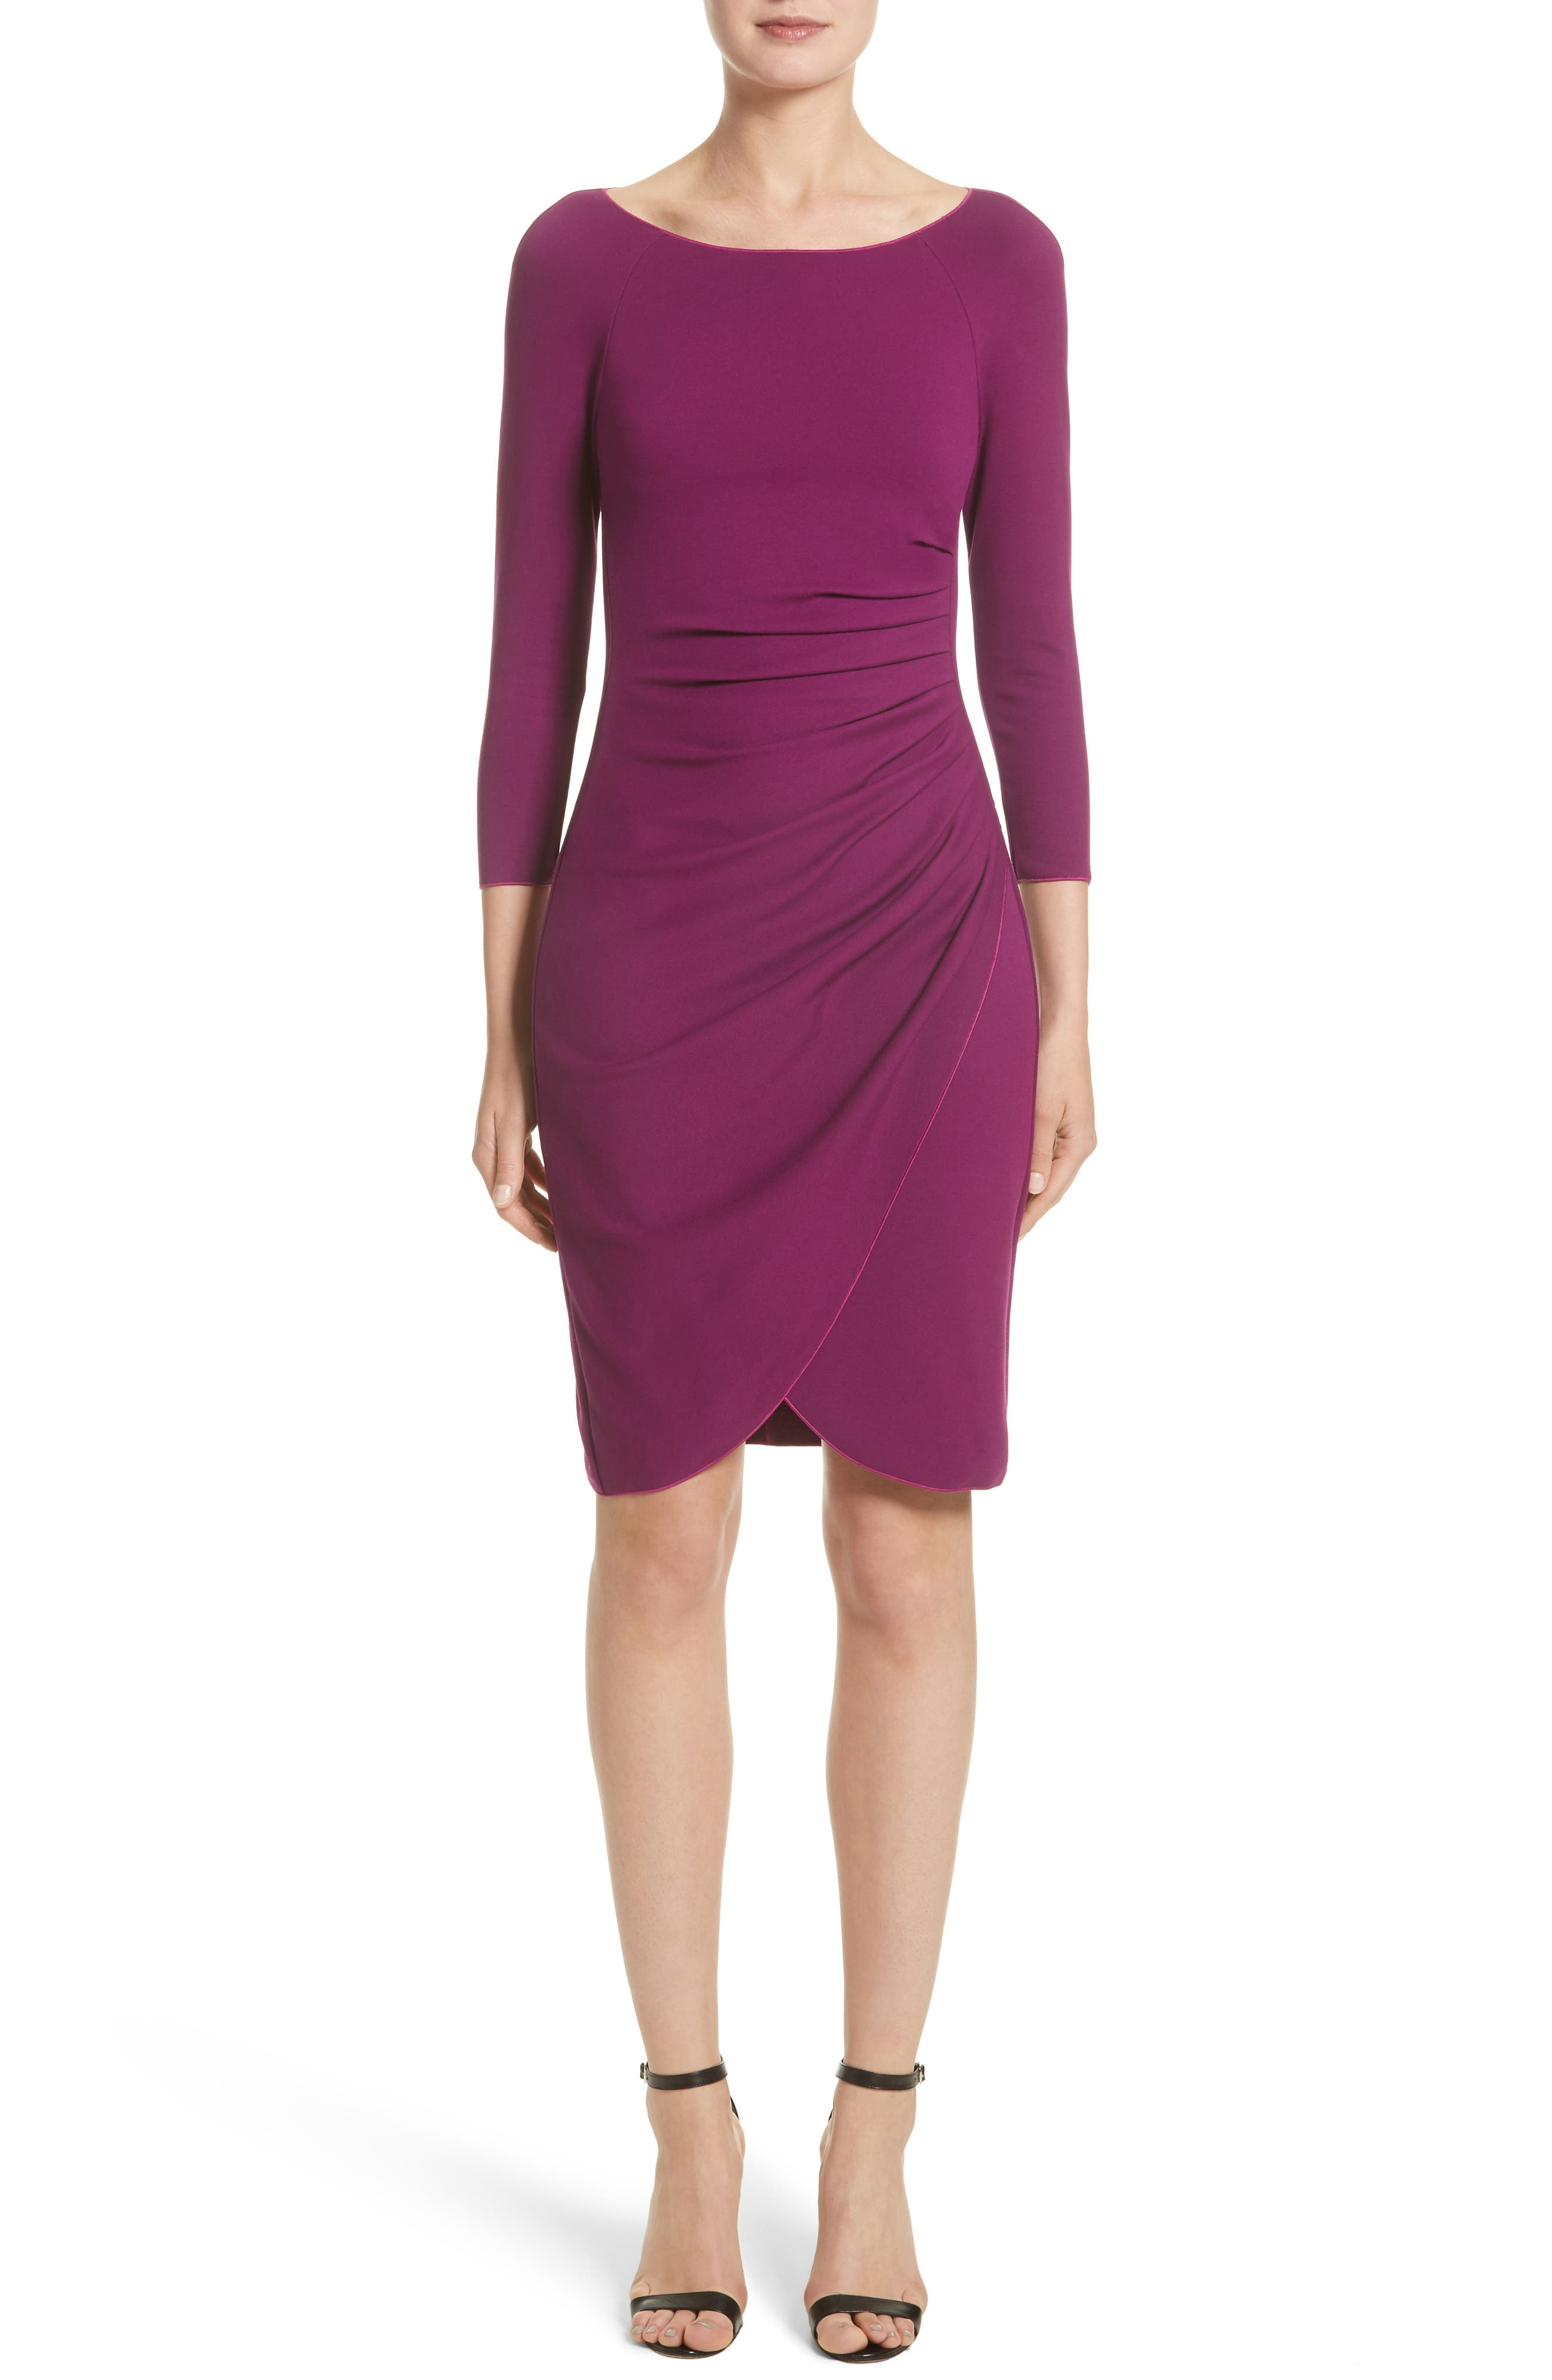 Alternate Image 1 Selected - Armani Collezioni Milano Jersey Petal Hem Dress (Nordstrom Exclusive)